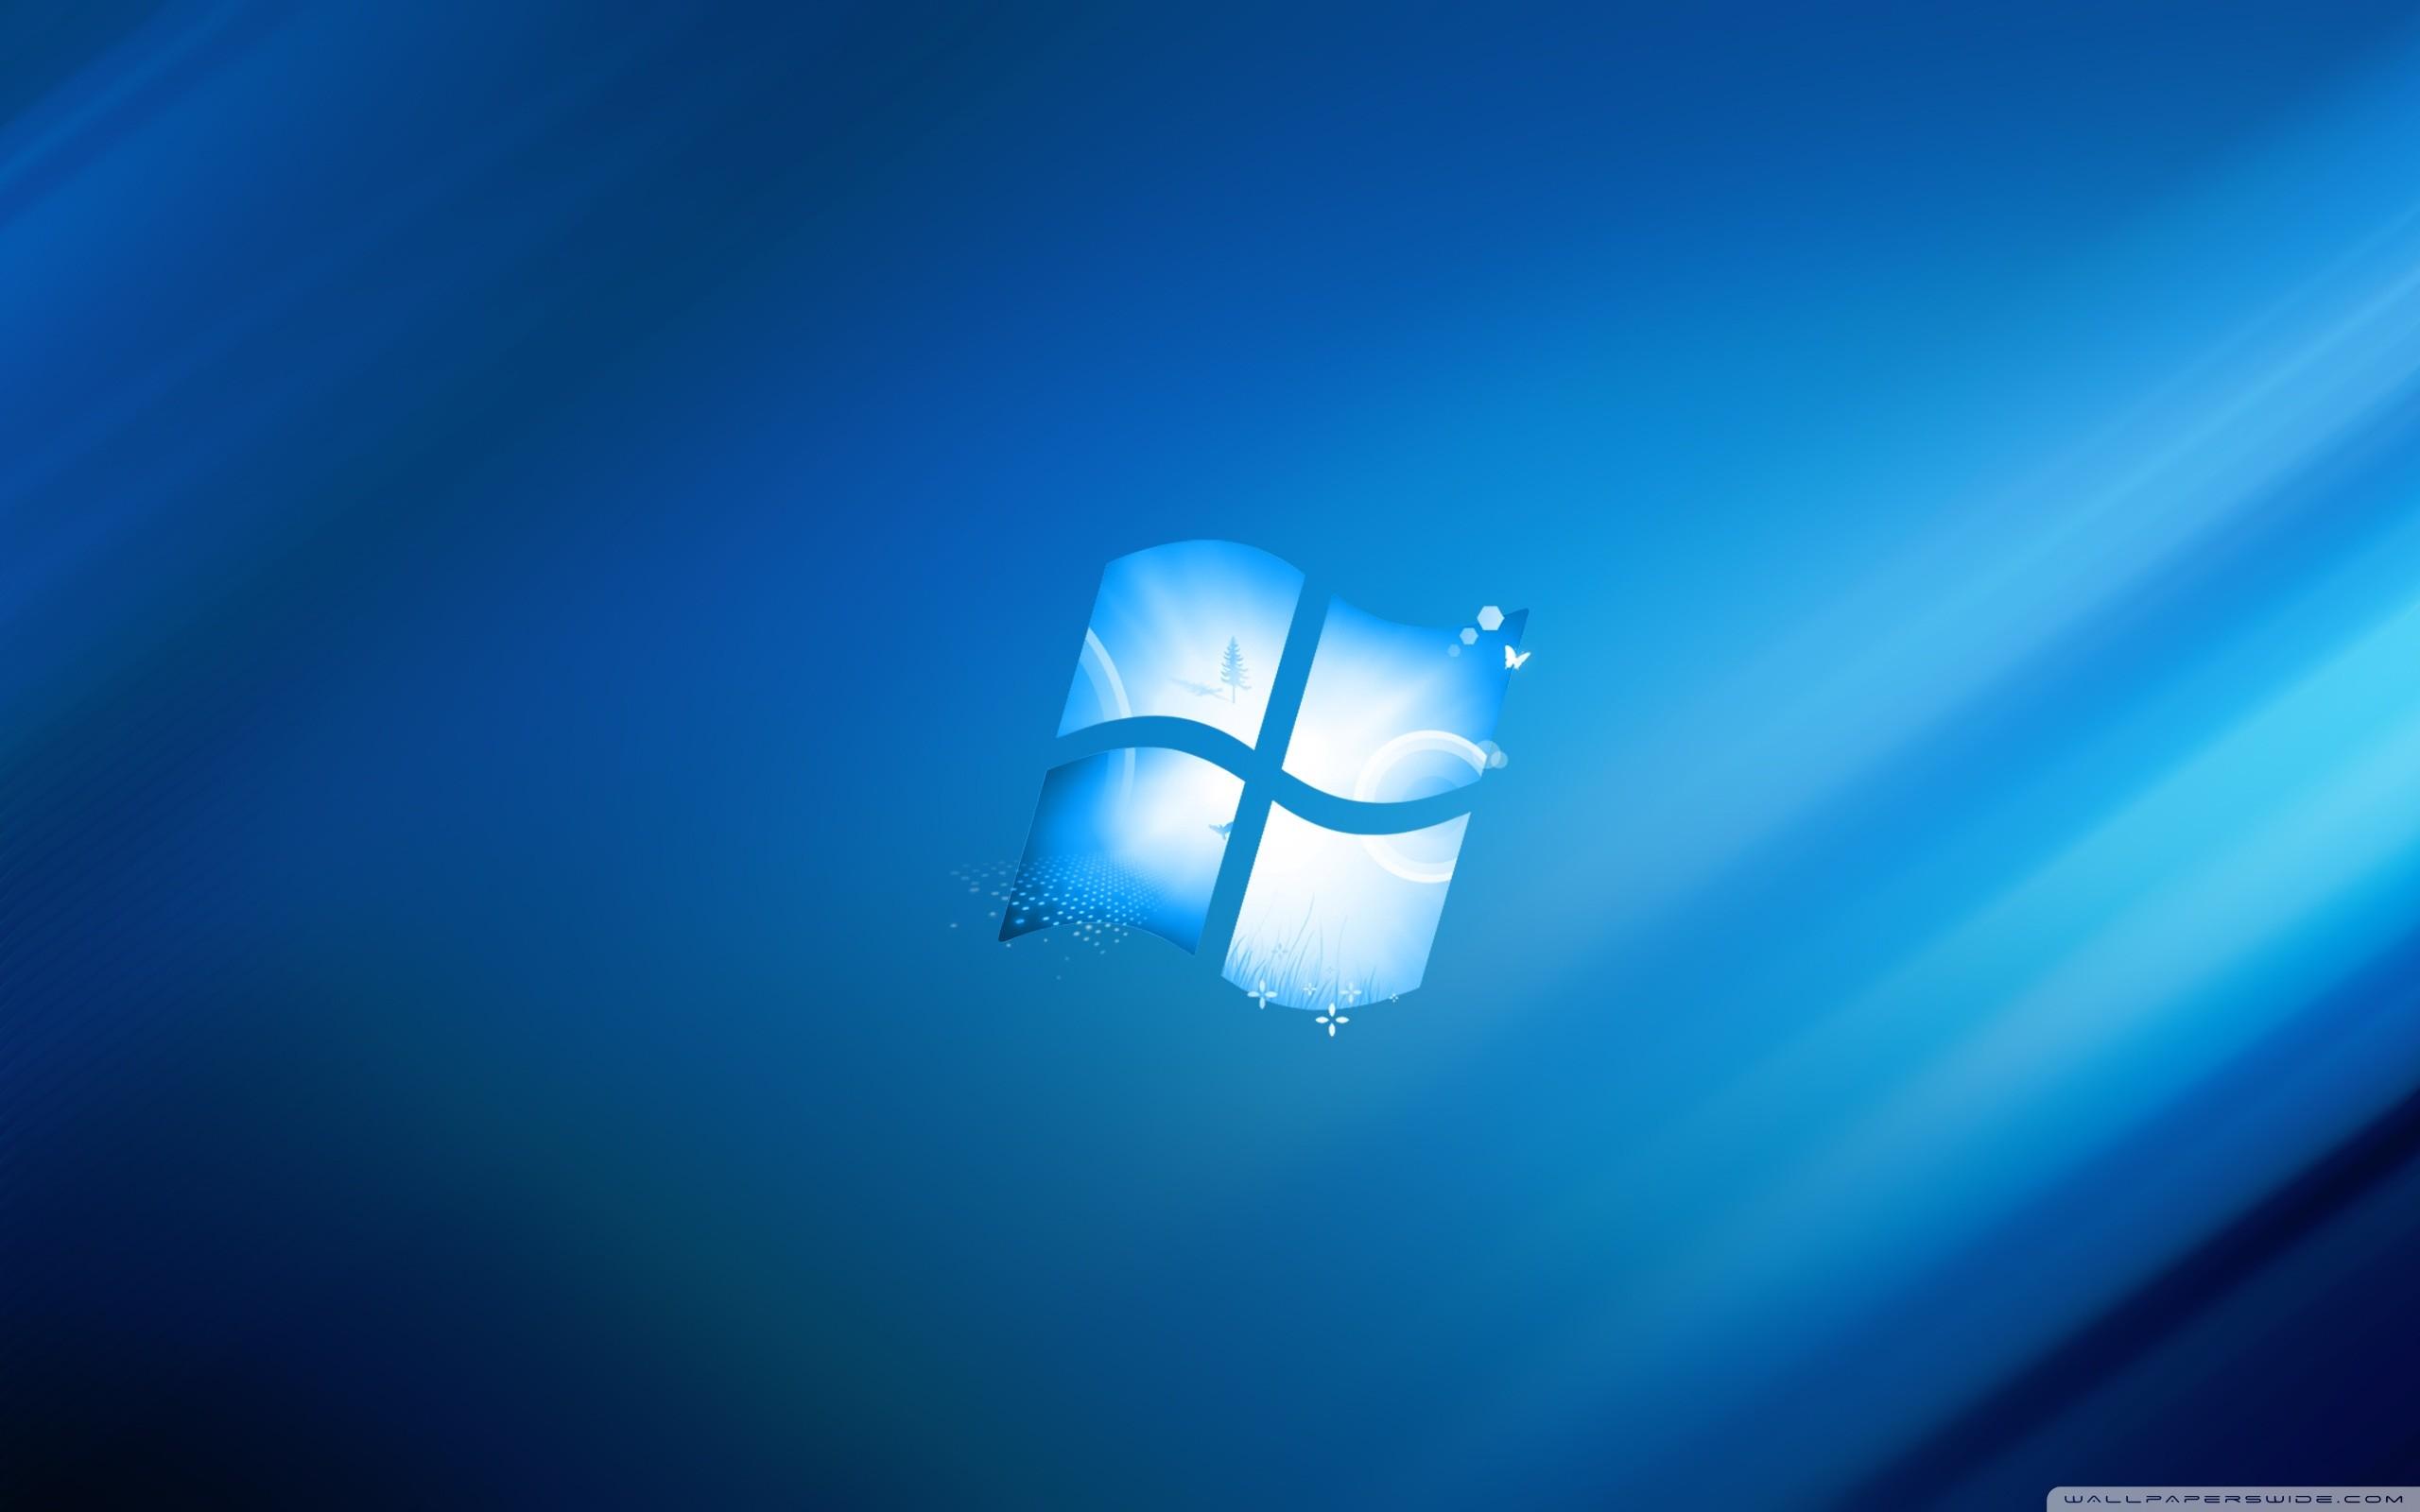 68+] New Hd Desktop Backgrounds on ...